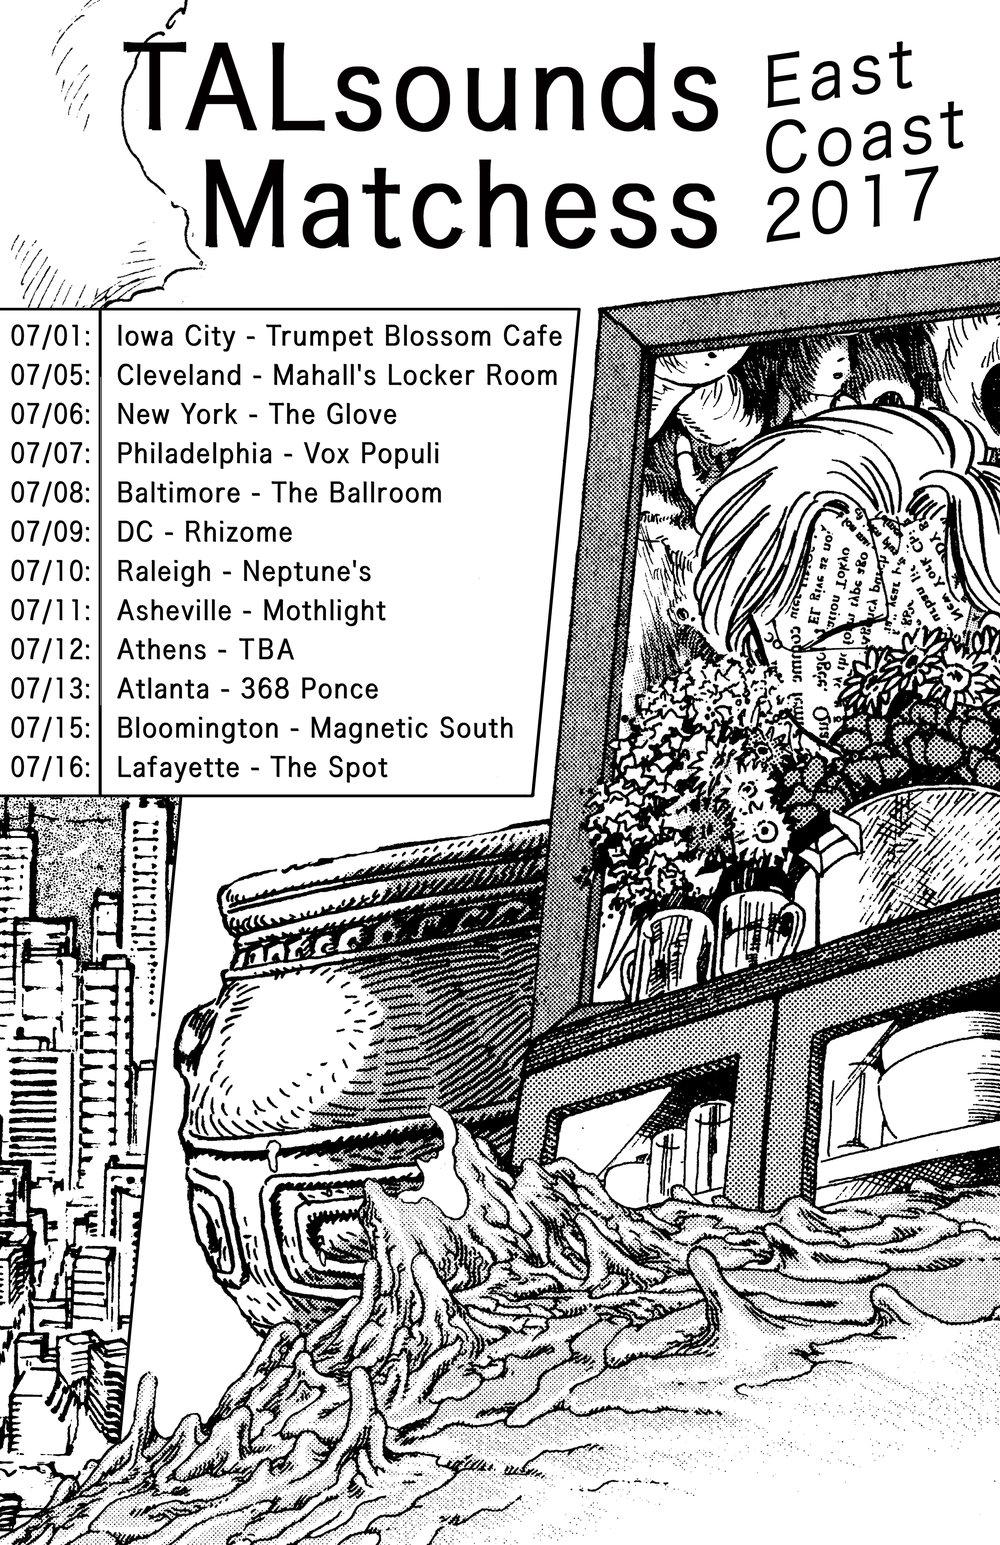 Tour — Blog — Ba Da Bing Records & Management